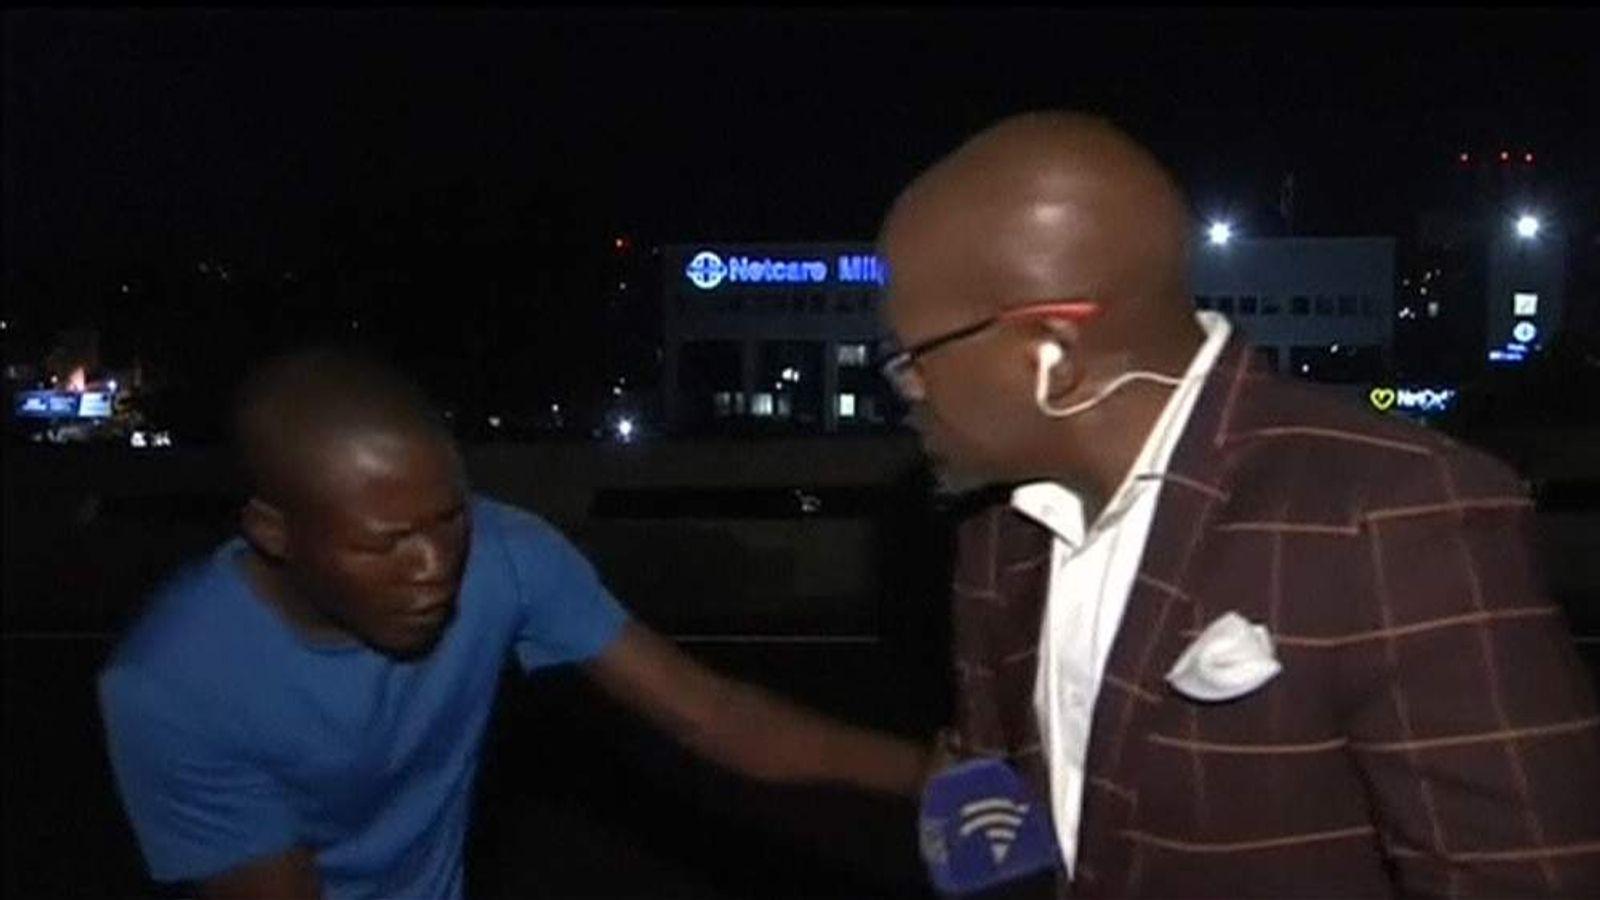 South Africa SABC reporter mugged on camera